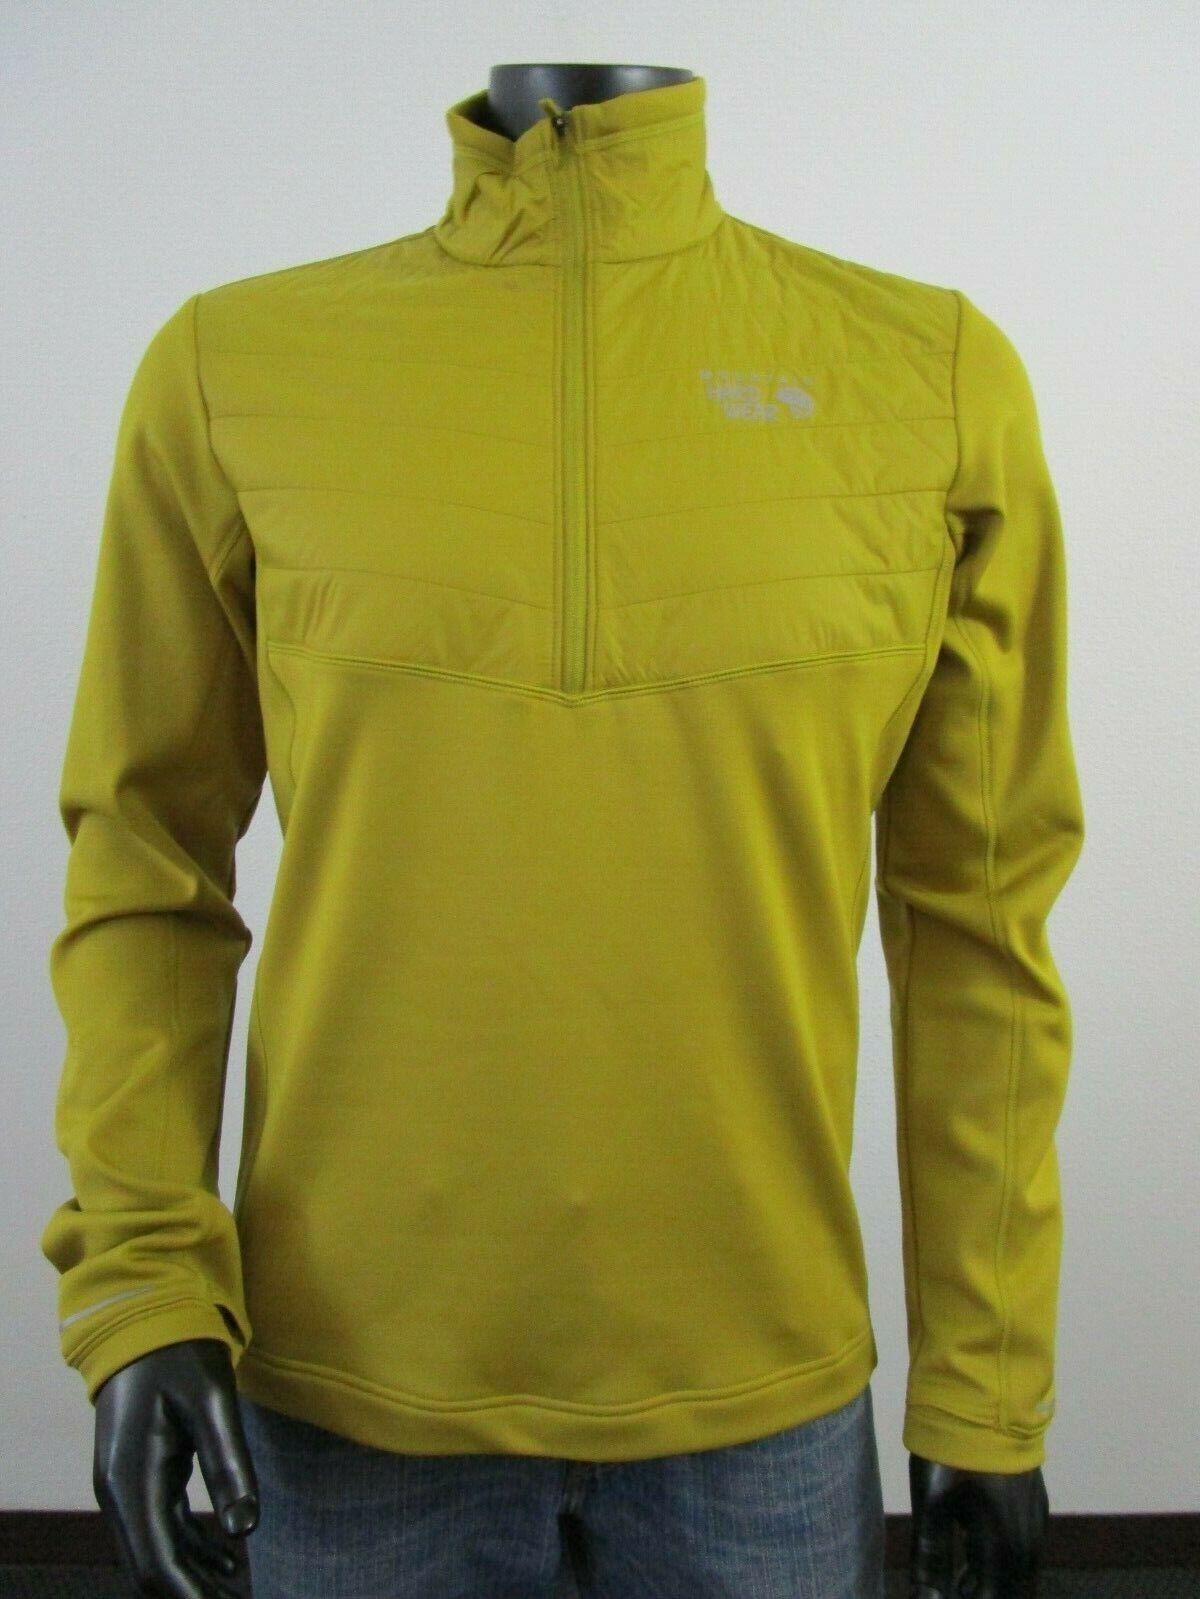 Mens M Mountain Hardwear 32 Degrees Insulated 1//2 Zip Fleece Top Jacket Citron